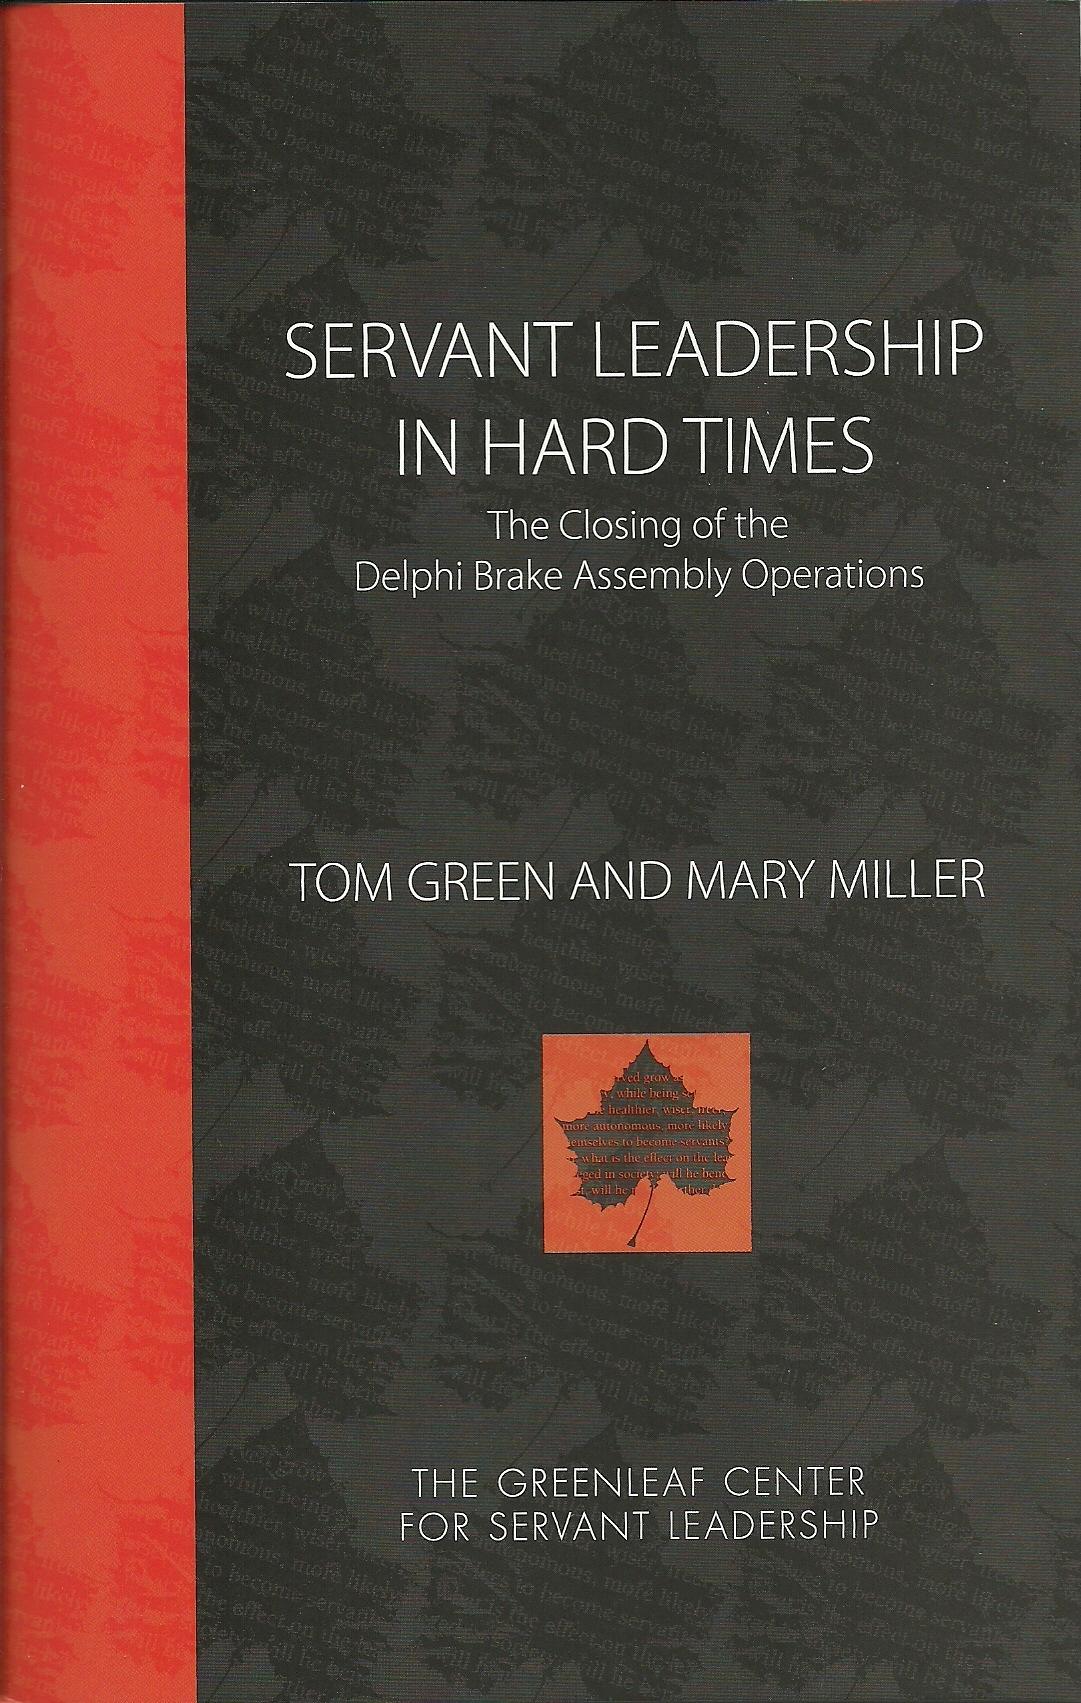 SERVANT LEADERSHIP IN HARD TIMES E-book